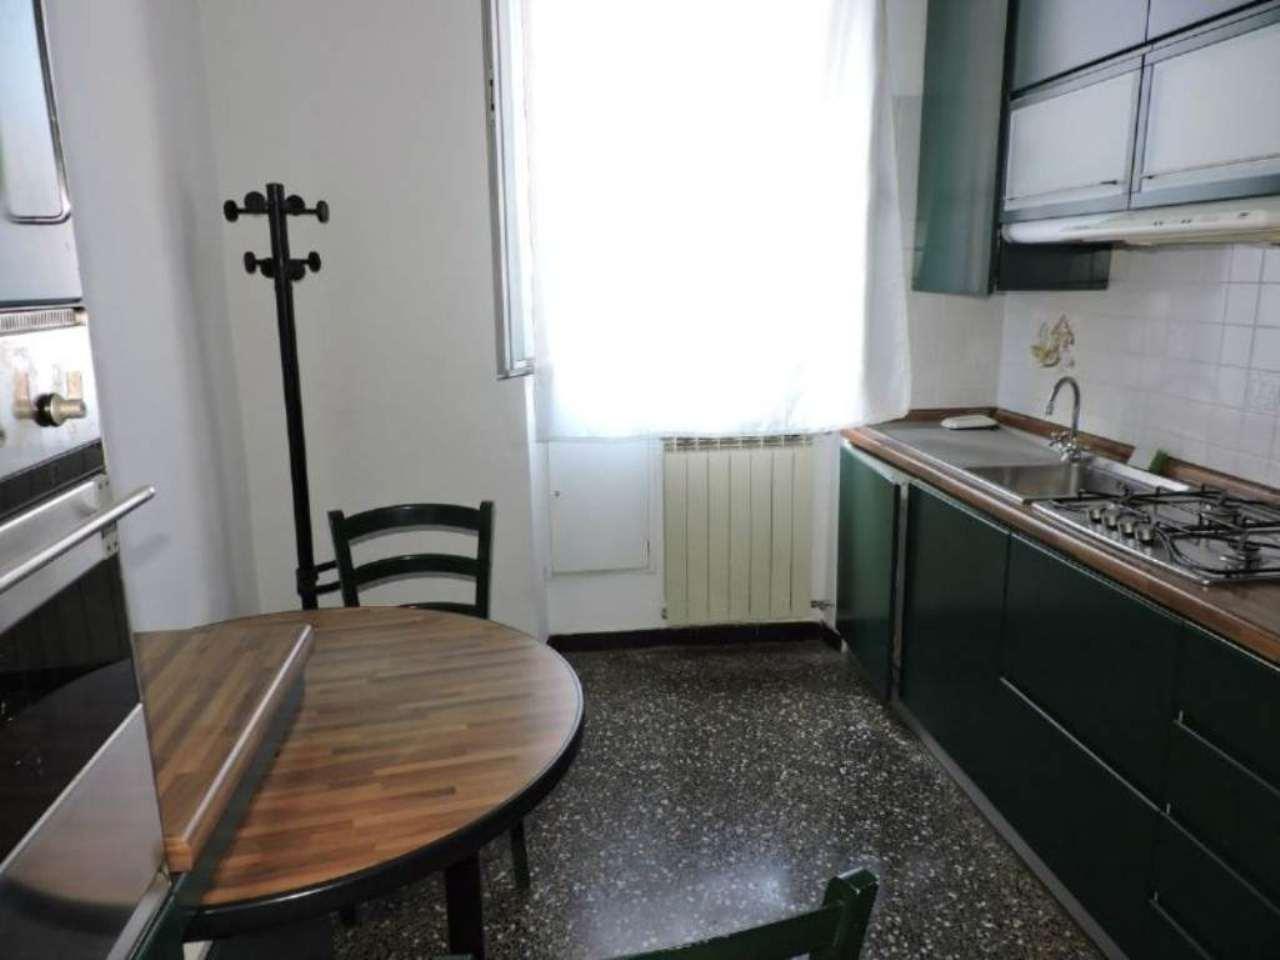 Bilocale Genova Via Dino Col 4